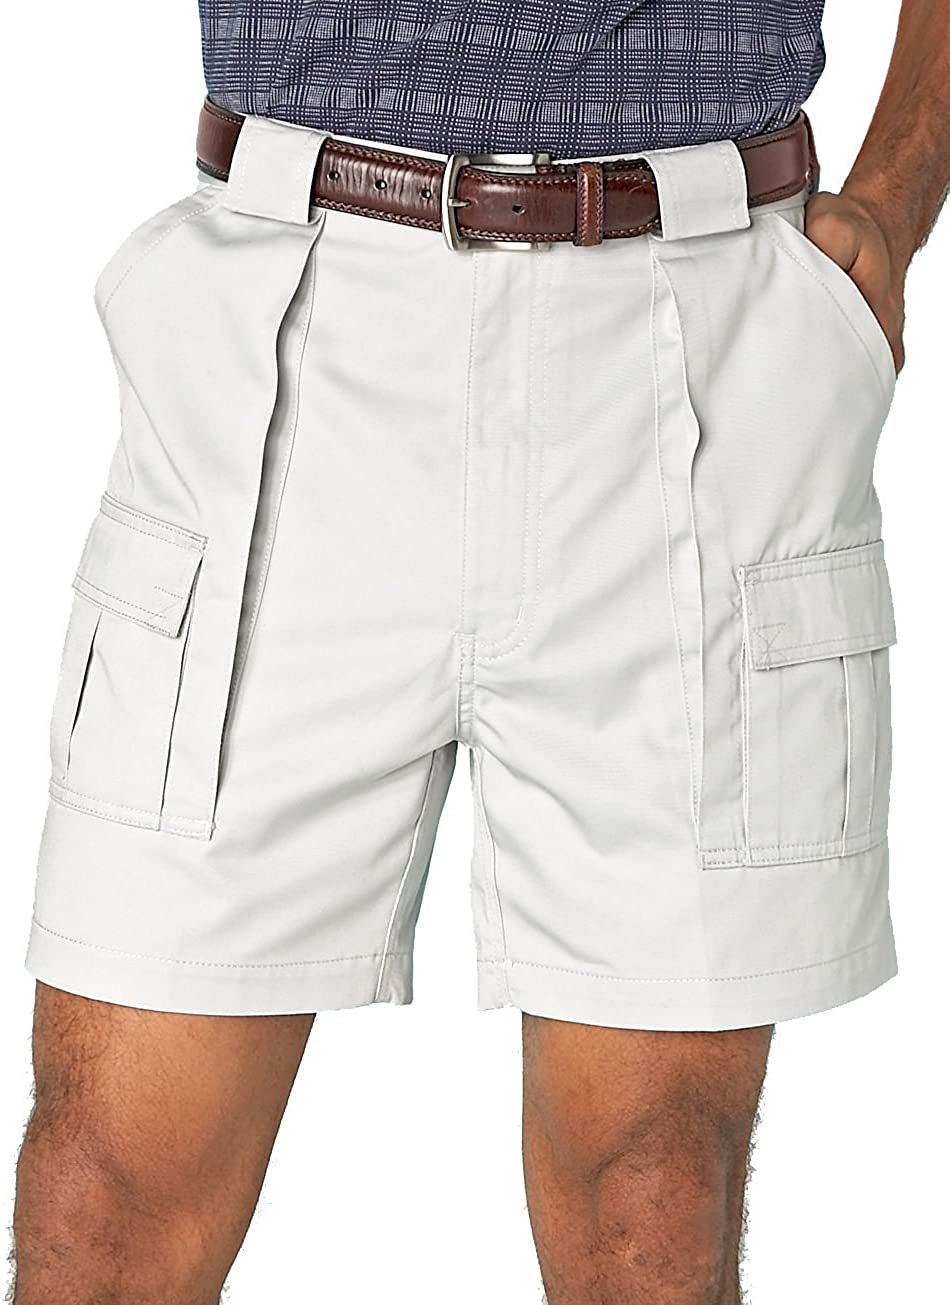 Weekender Men's Trader Cargo Short